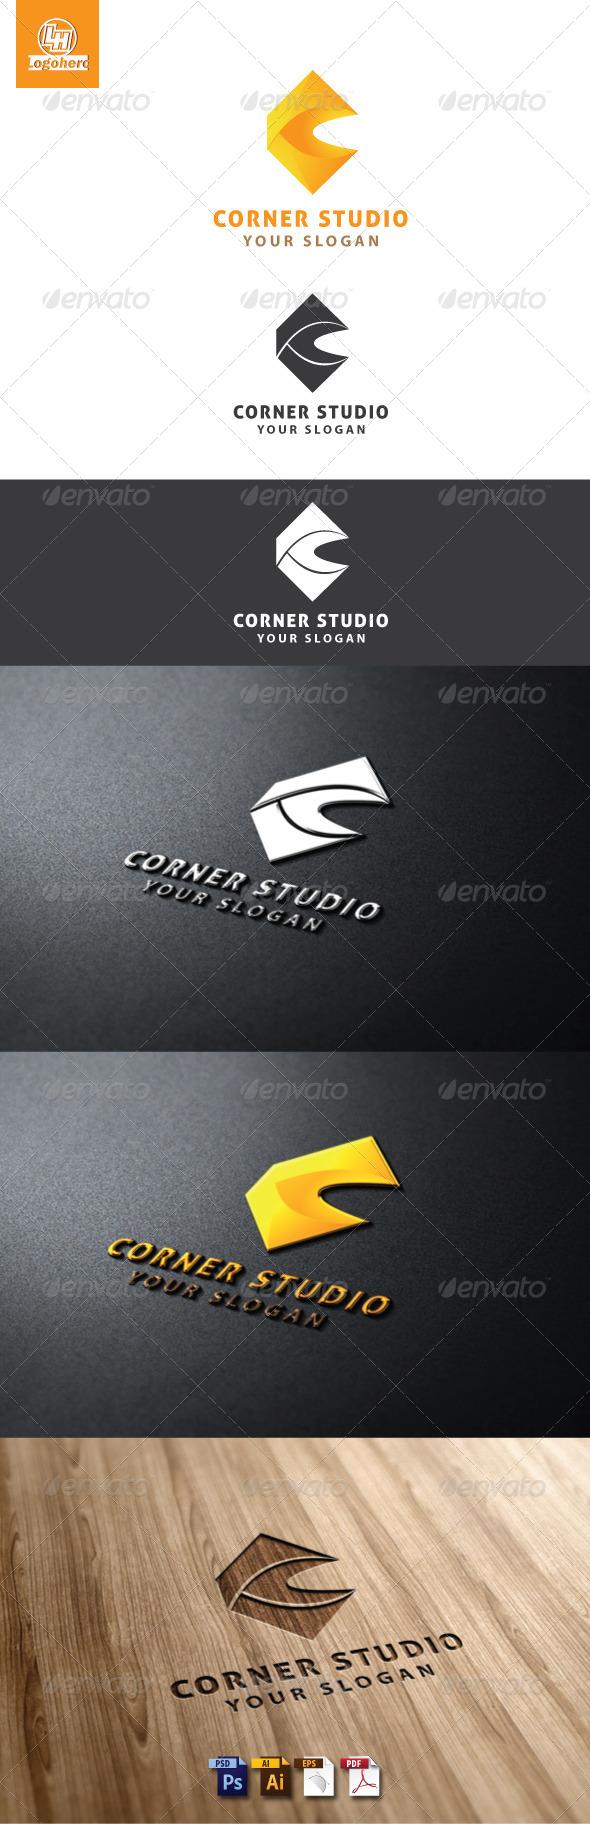 Corner Studio Logo Template - Letters Logo Templates